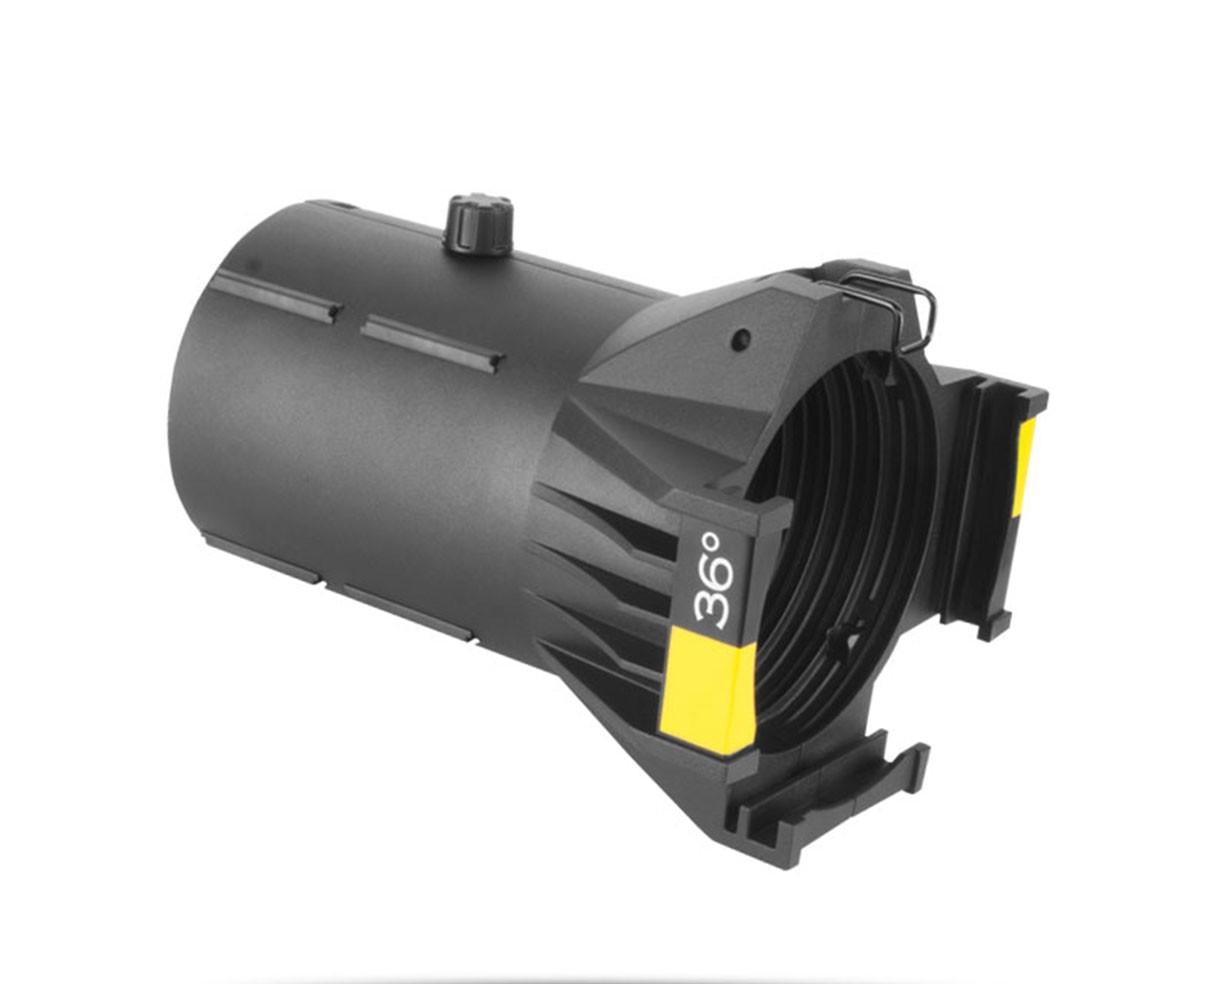 CHAUVET Professional 36 Degree Ovation Ellipsoidal HD Lens Tube